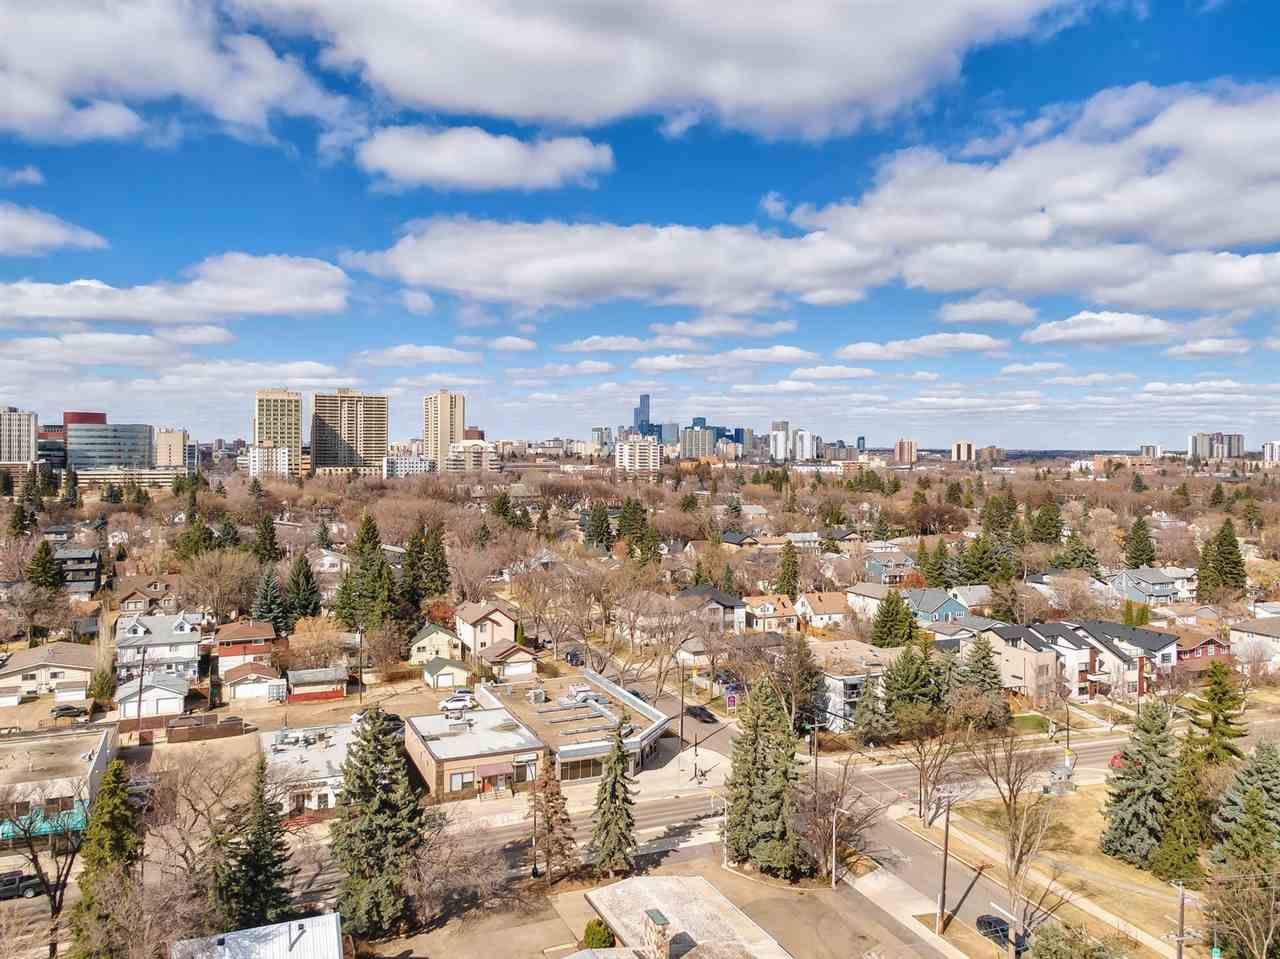 Main Photo: 11209 75 Avenue in Edmonton: Zone 15 House for sale : MLS®# E4240354